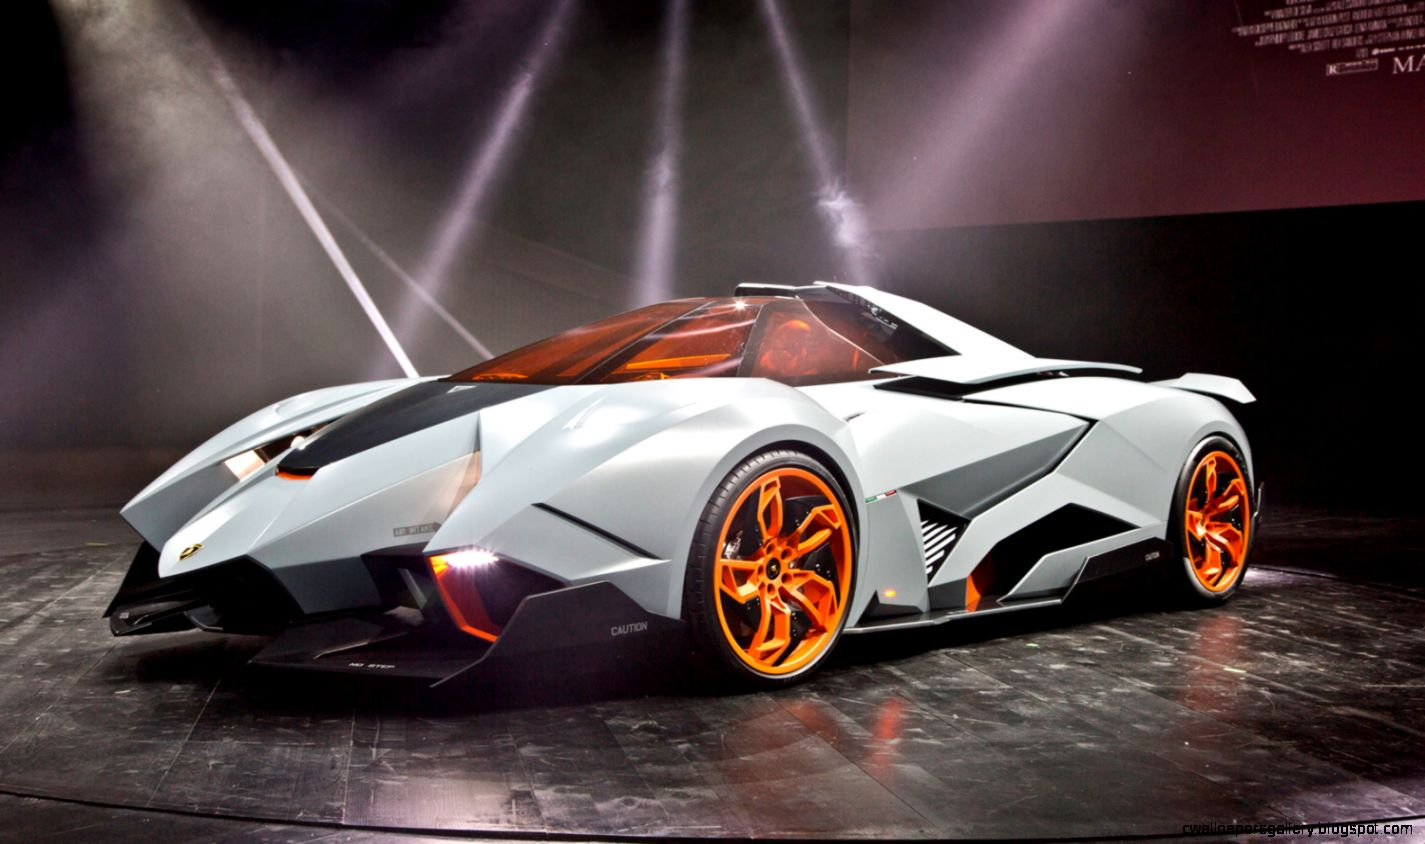 Lamborghini Egoista Wallpaper Hd | Wallpapers Gallery